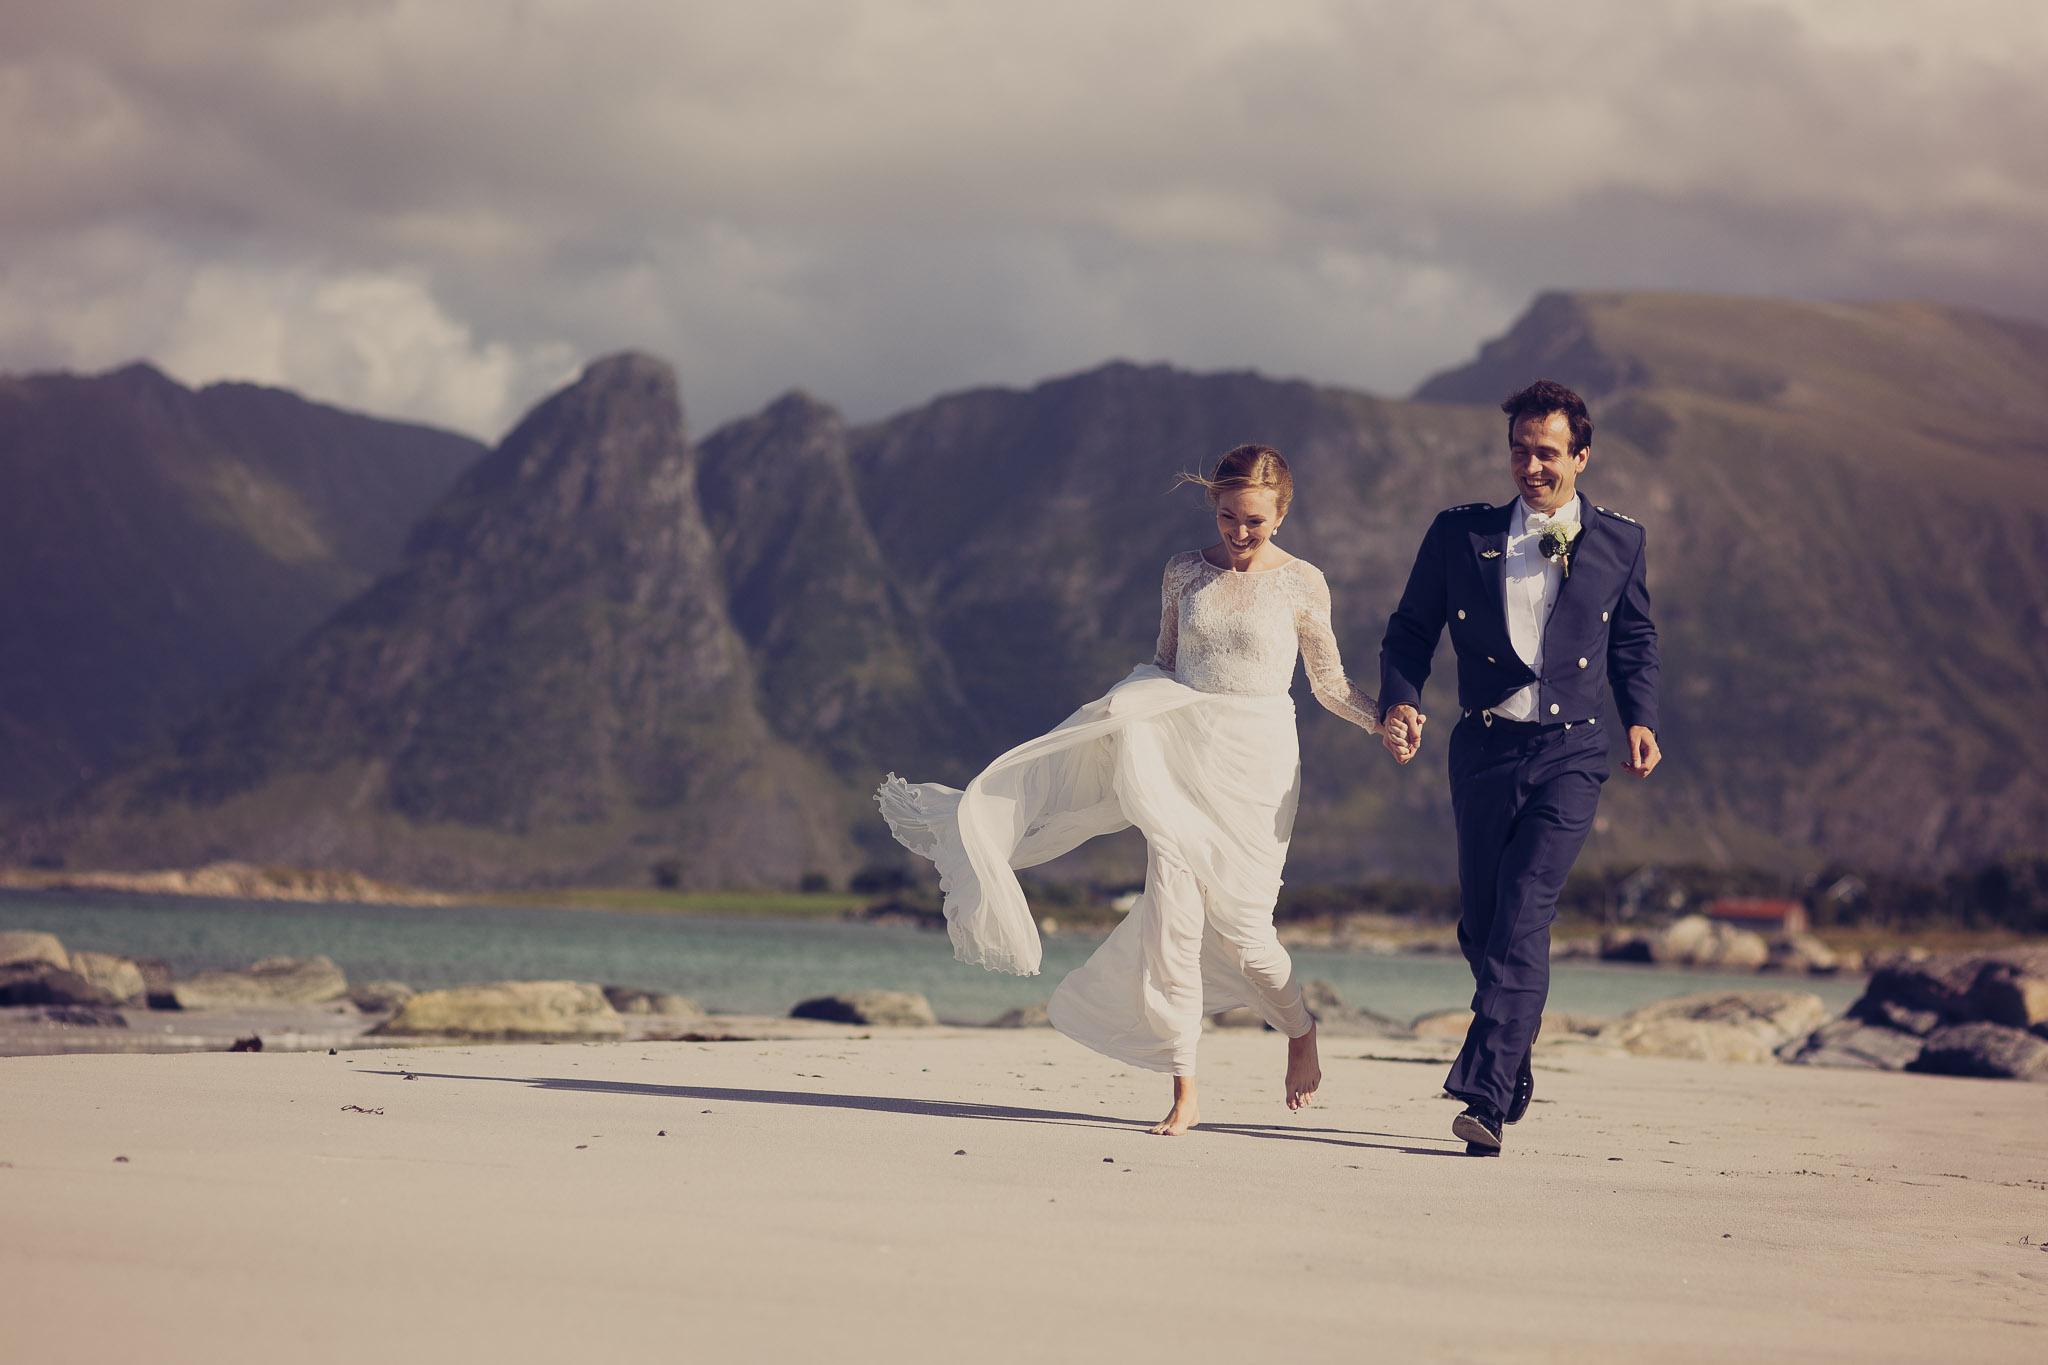 Bryllupsfotografering-lofoten-heldags-fjell-29